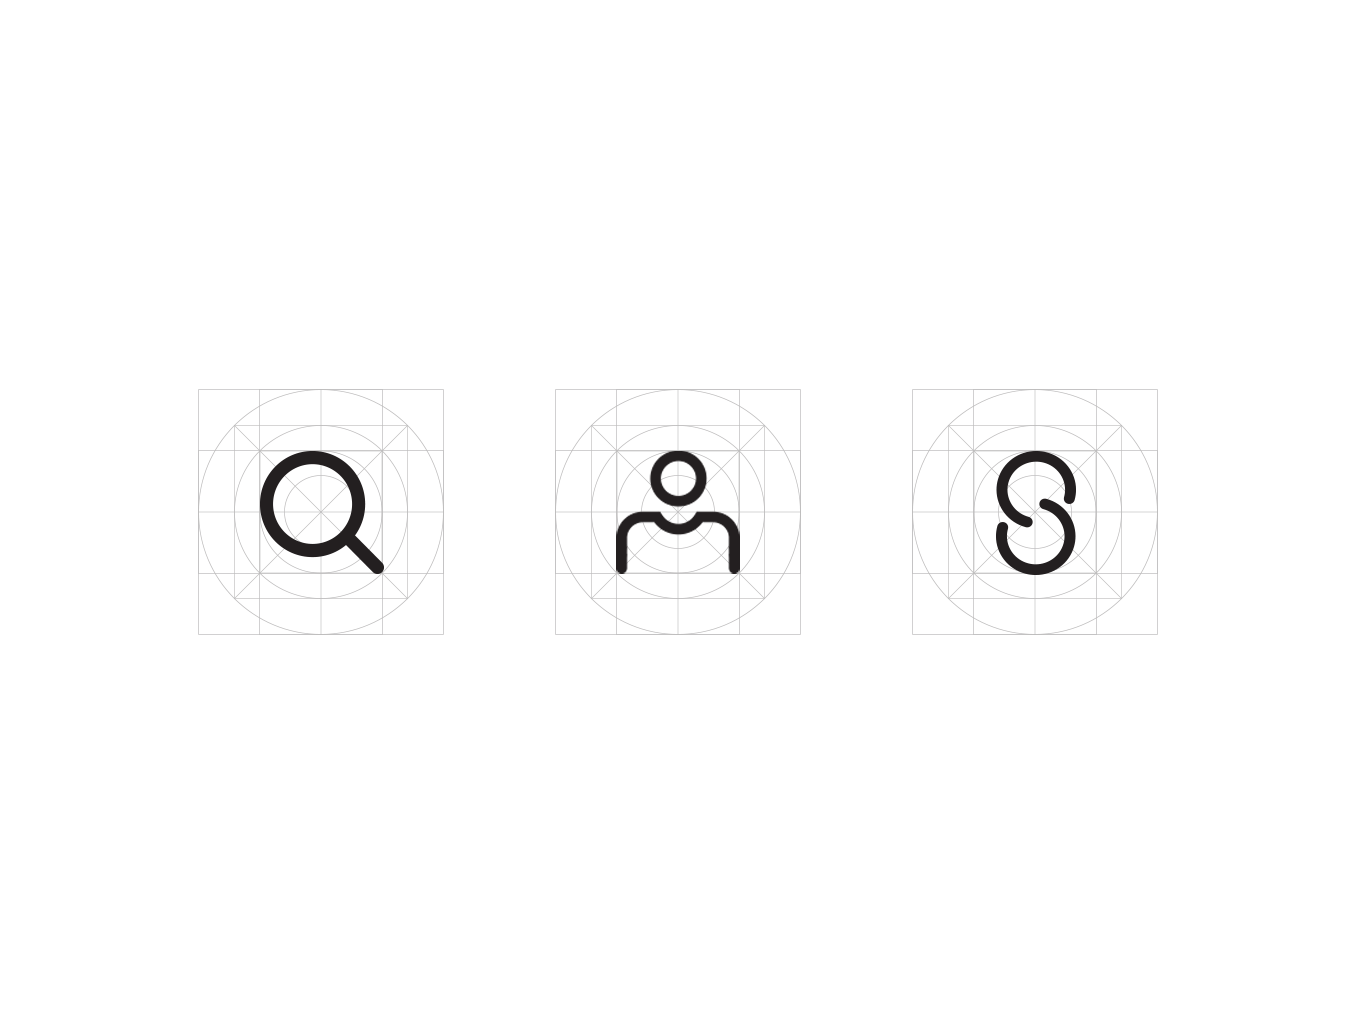 Optical Grid Icons optical grid icons trendy icons web icons grid user icon illustrator irfan ali pakistan ui usa artist custom design custom illustration illustration ux designer grid base icons digital designer icon designer iconography